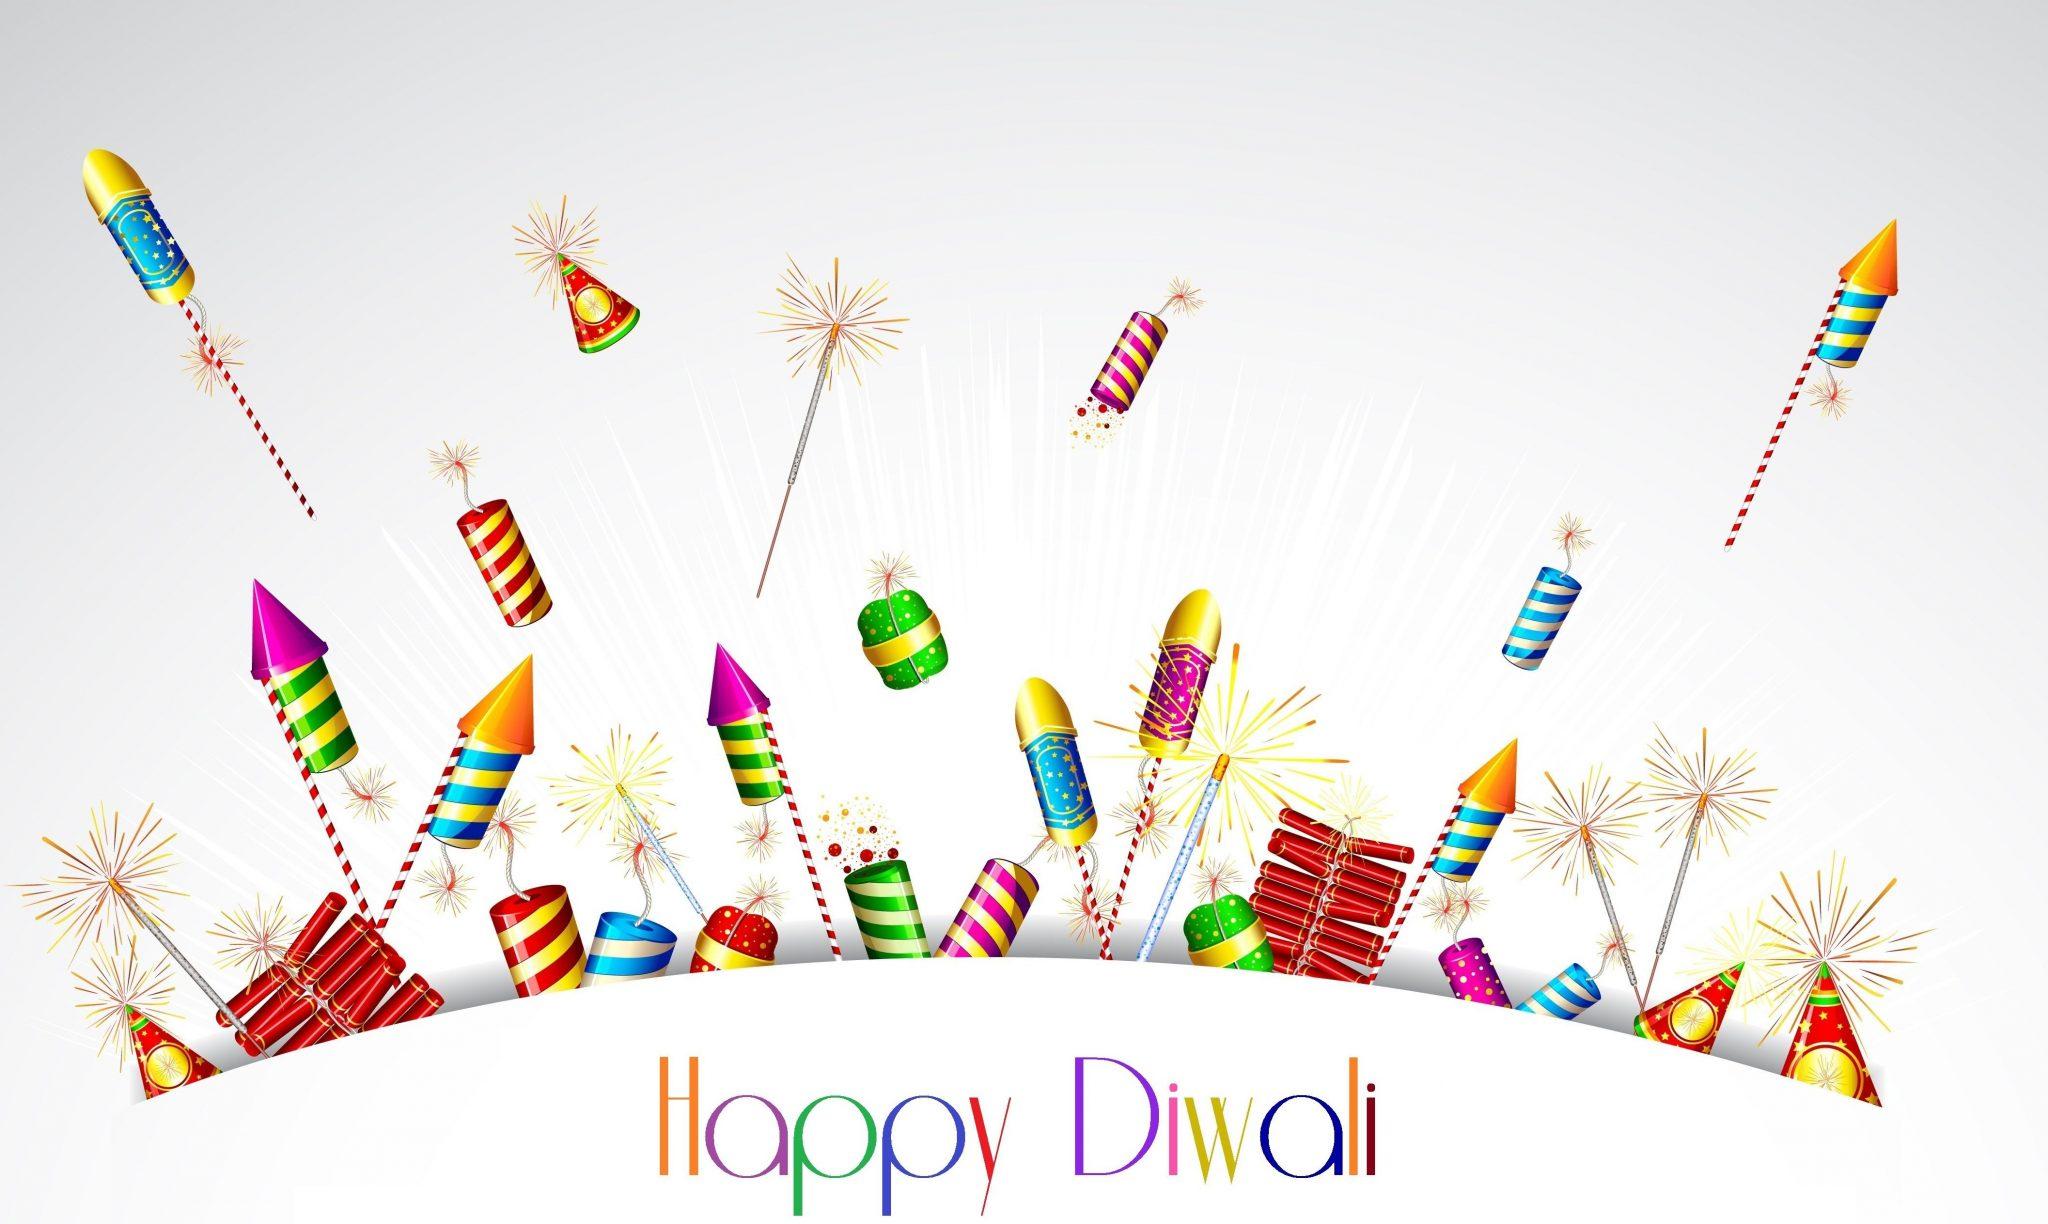 Happy Diwali Photos with Crackers